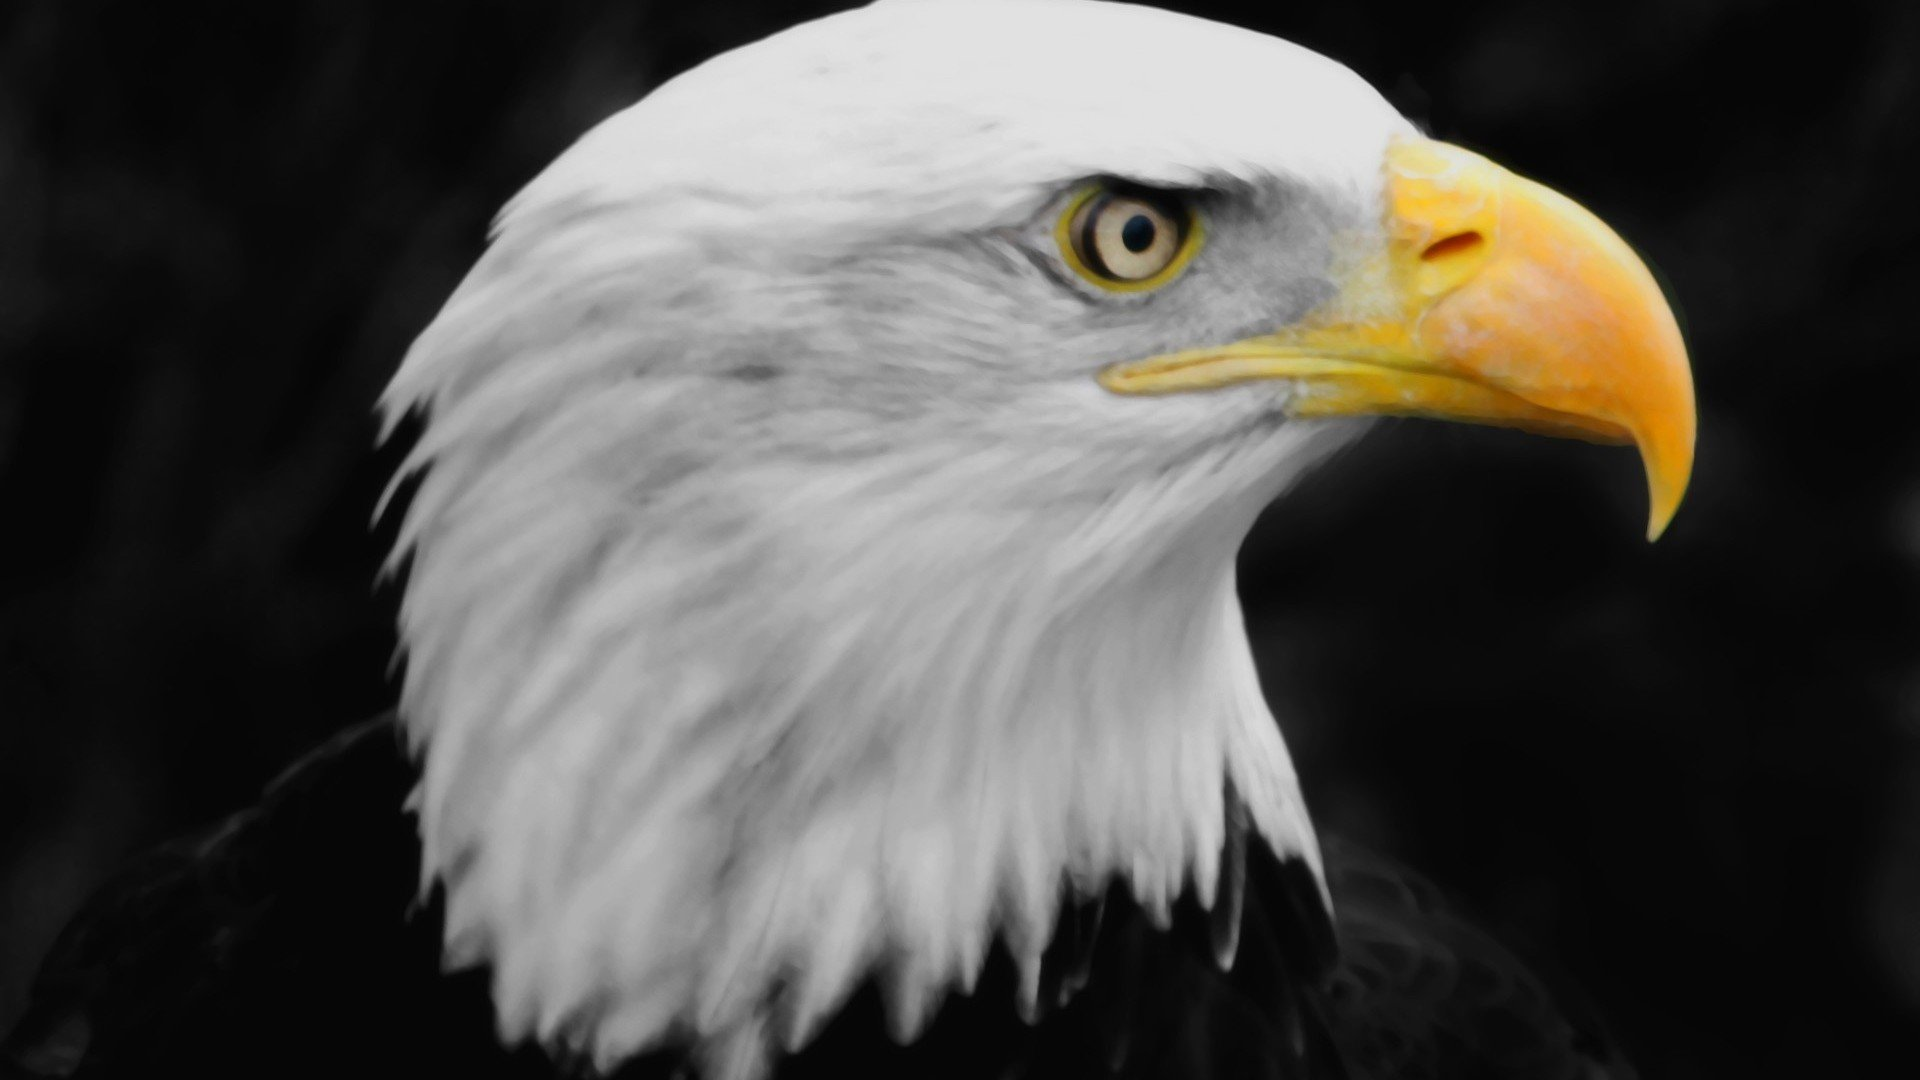 Golden Eagle Wallpaper - WallpaperSafari